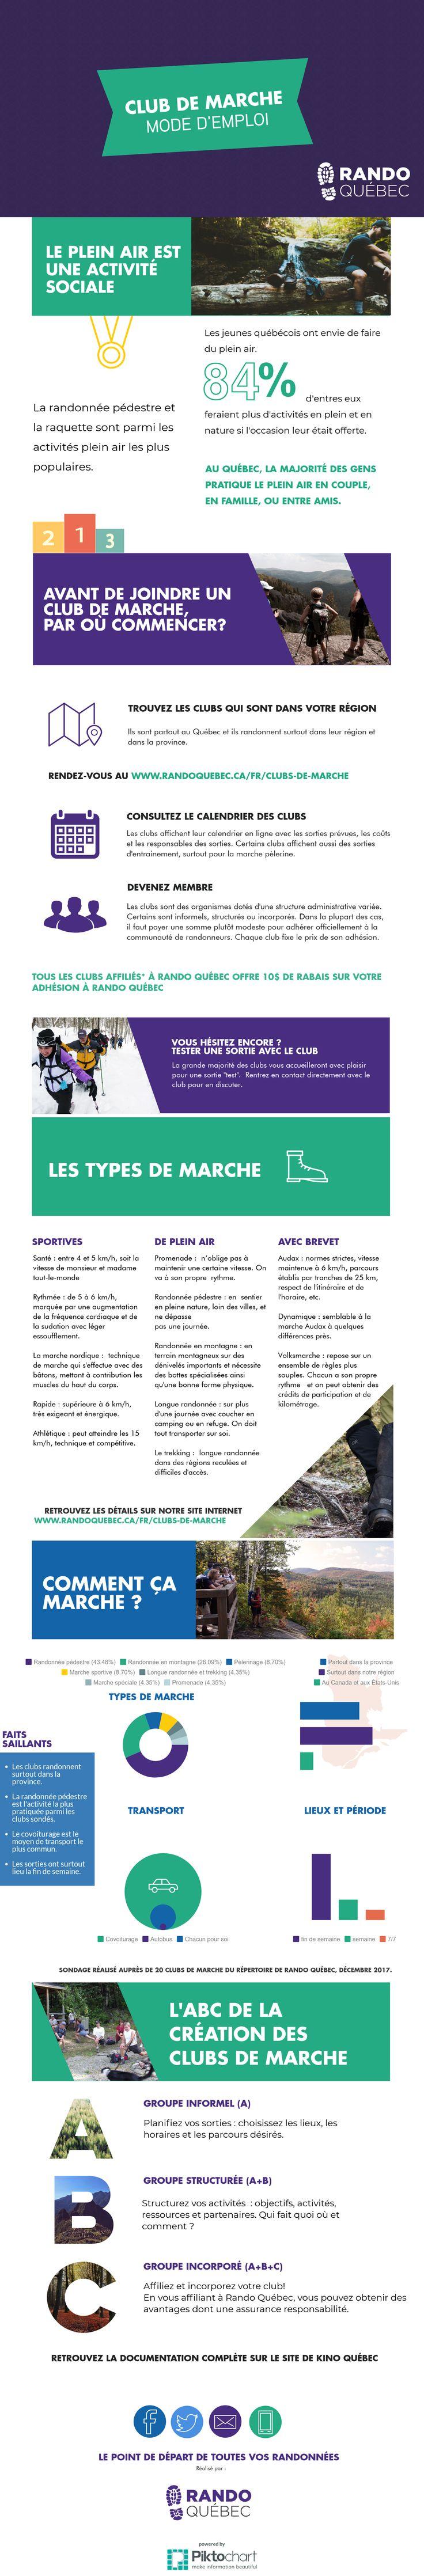 Club de marche : mode d'emploi - Blogue de Rando Québec